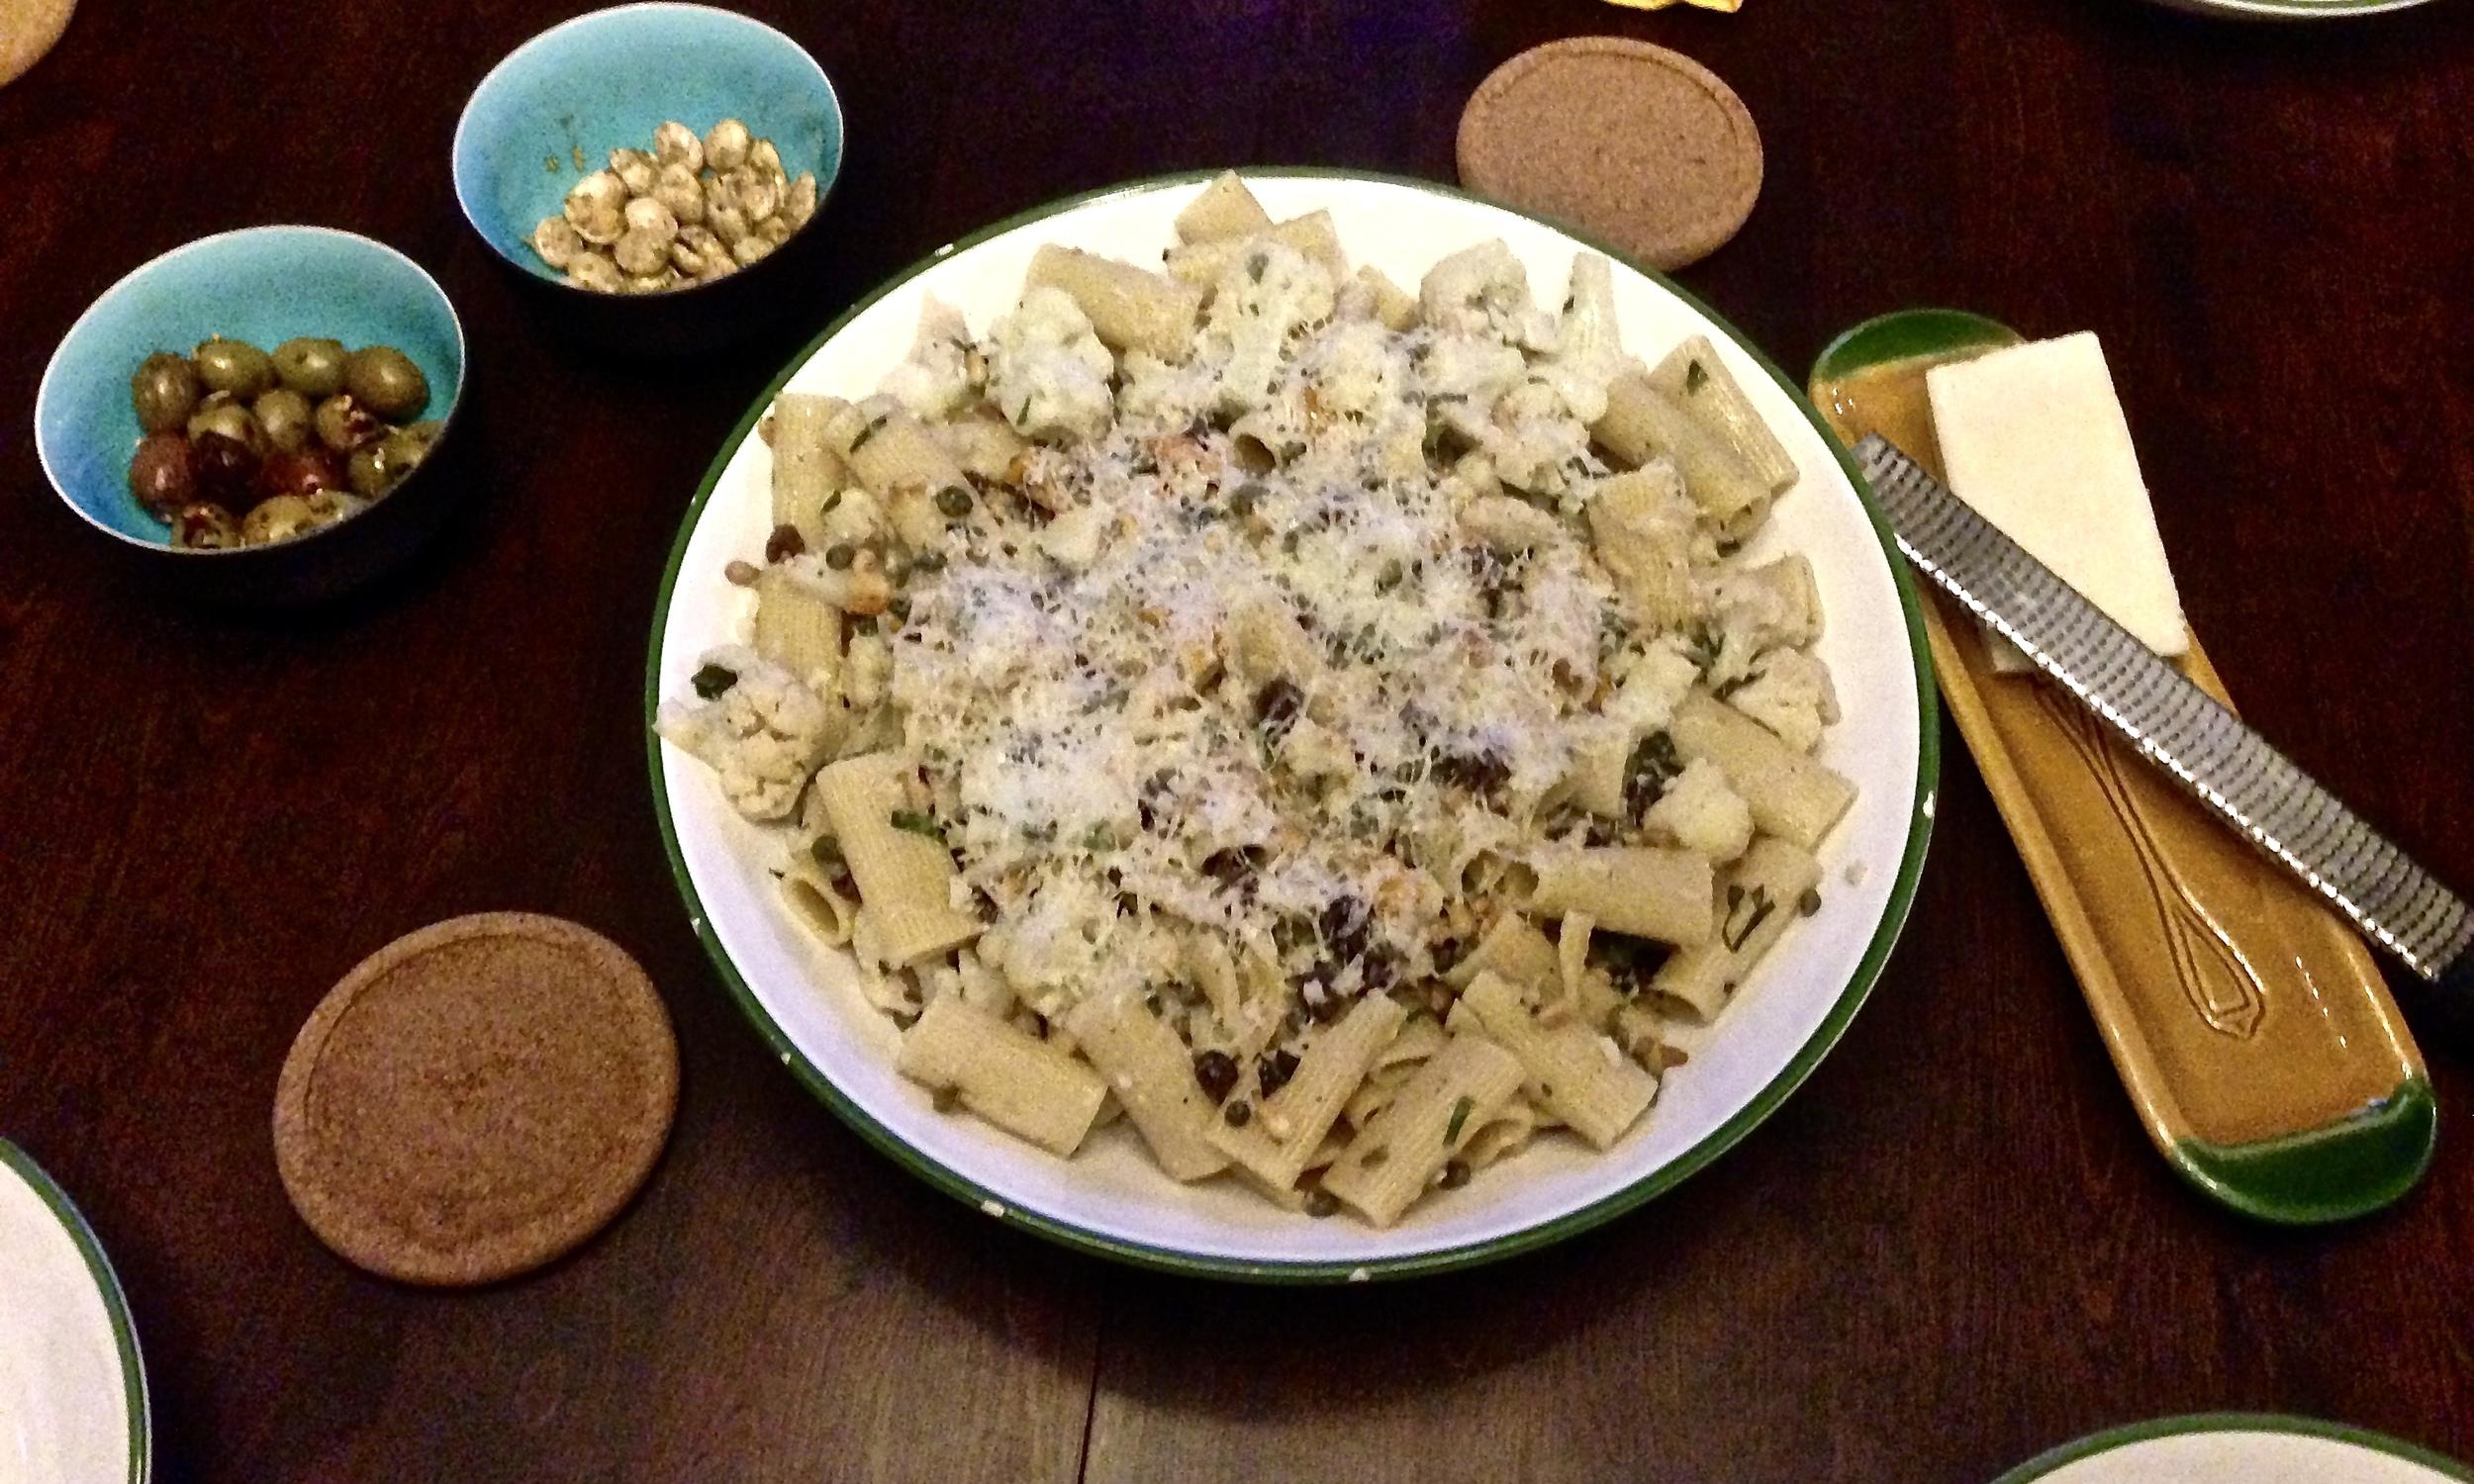 Rigatoni with cauliflower, capers, and raisins prepared with a dear friend in Tulsa, OK. Yum!